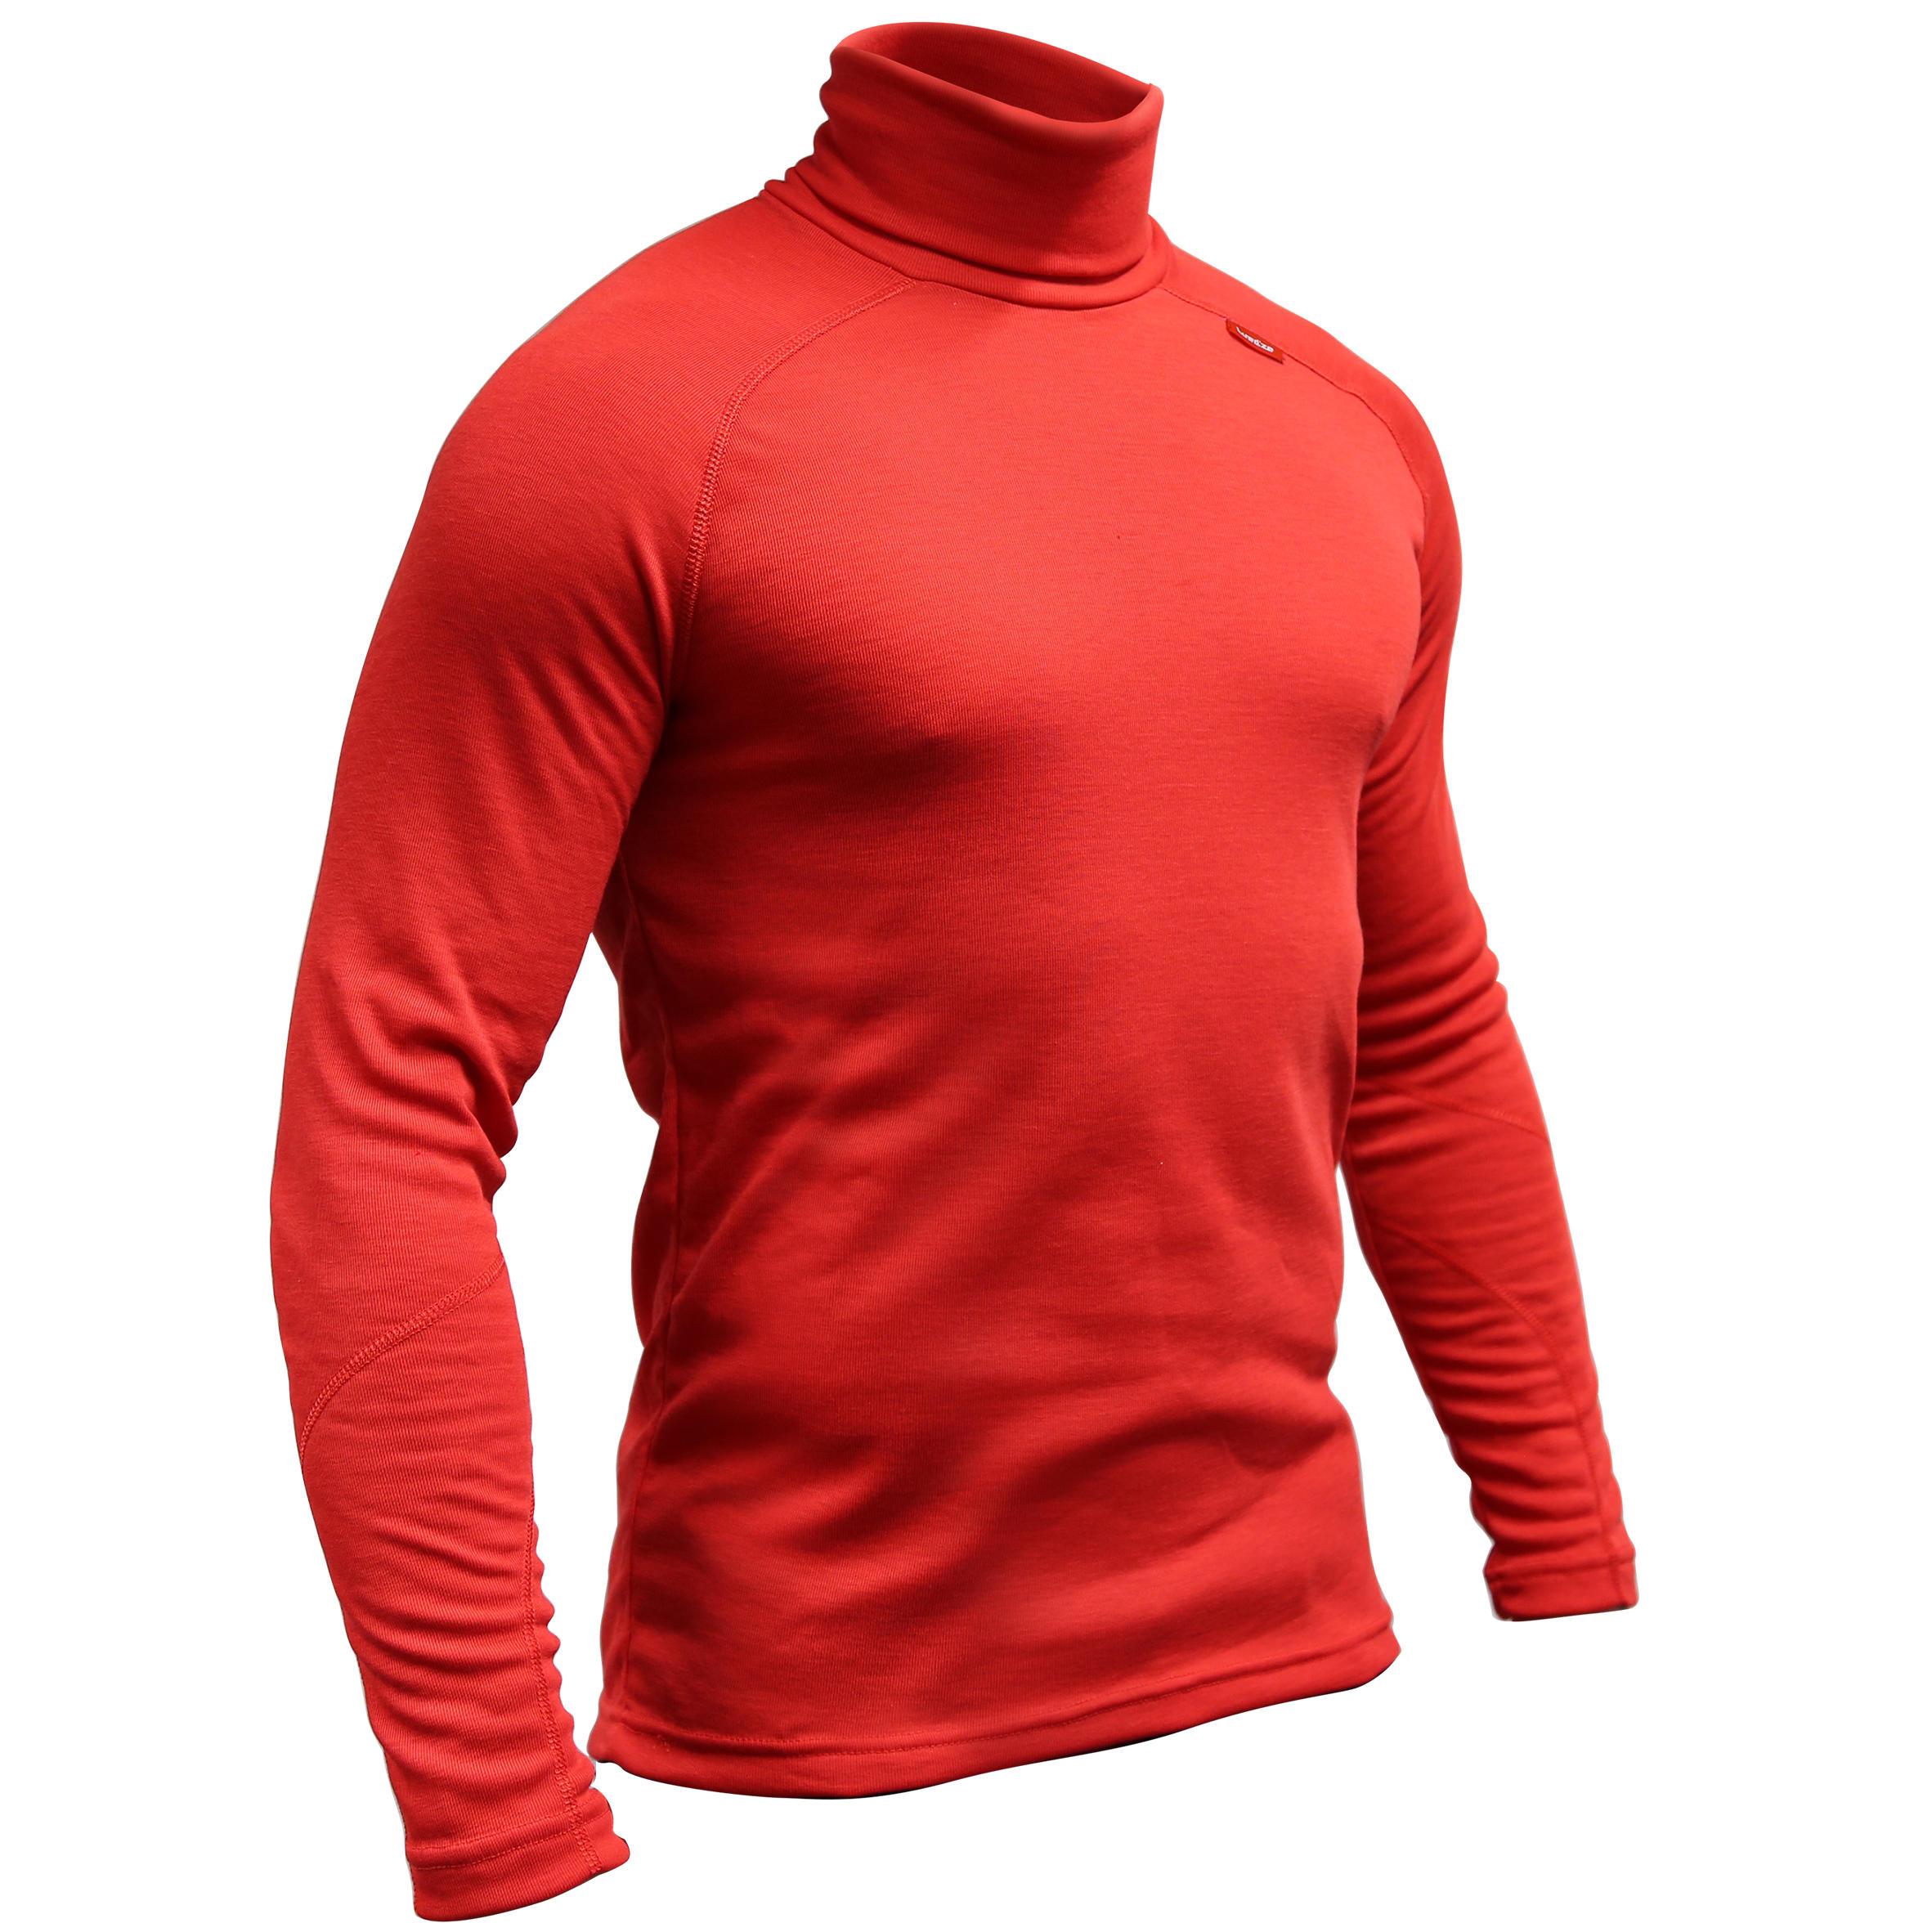 Wed'ze interior Hombres Red Ski Roller Warm Collar Simple Ropa XwOkTiuPZ